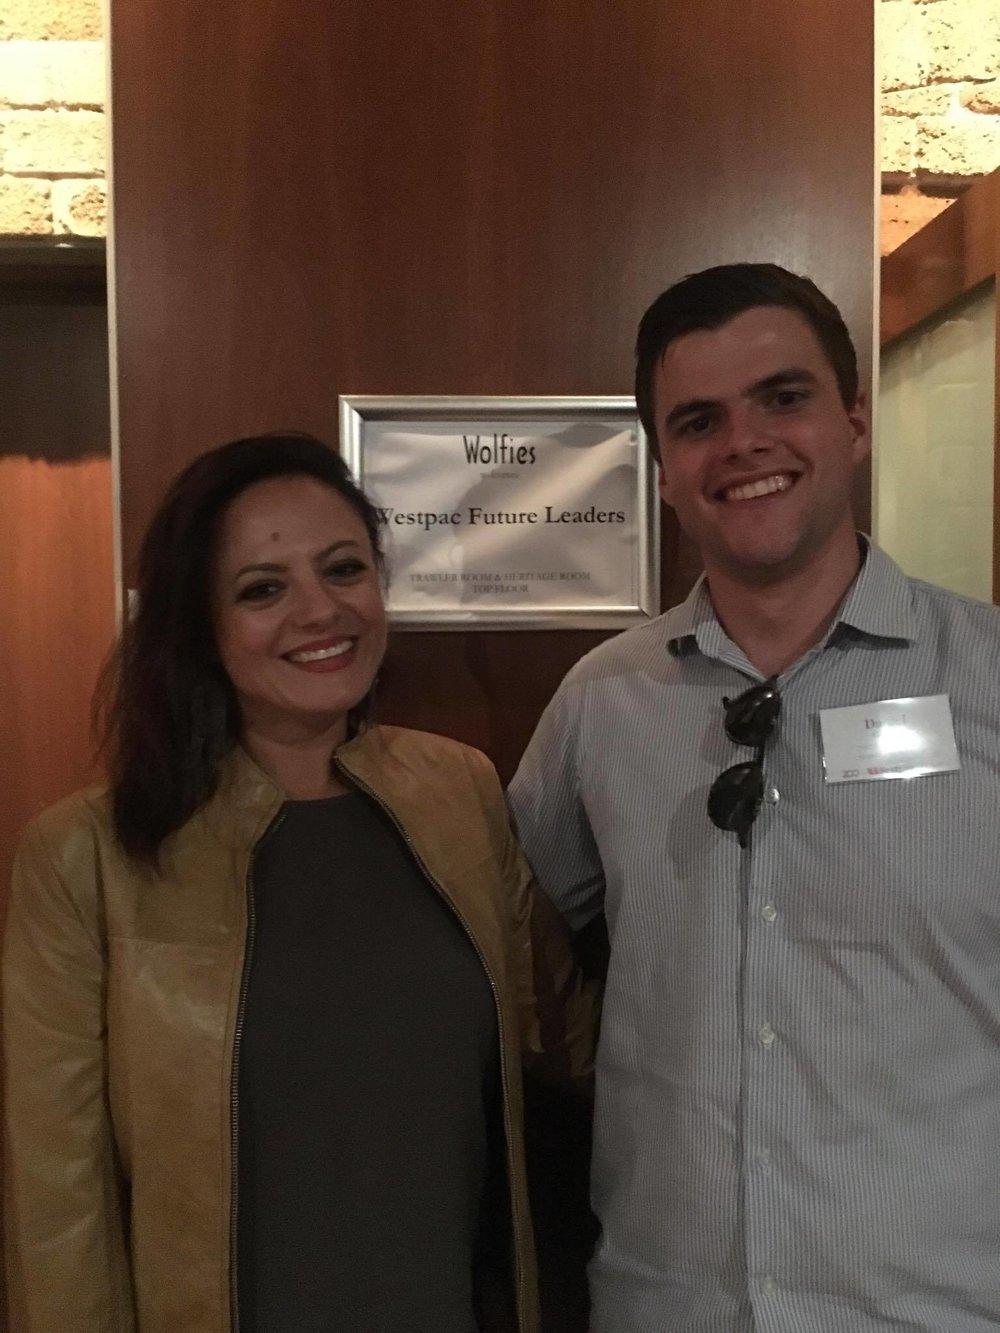 Westpac Future Leaders Dinner with fellow Scholar, Daniel Conley.